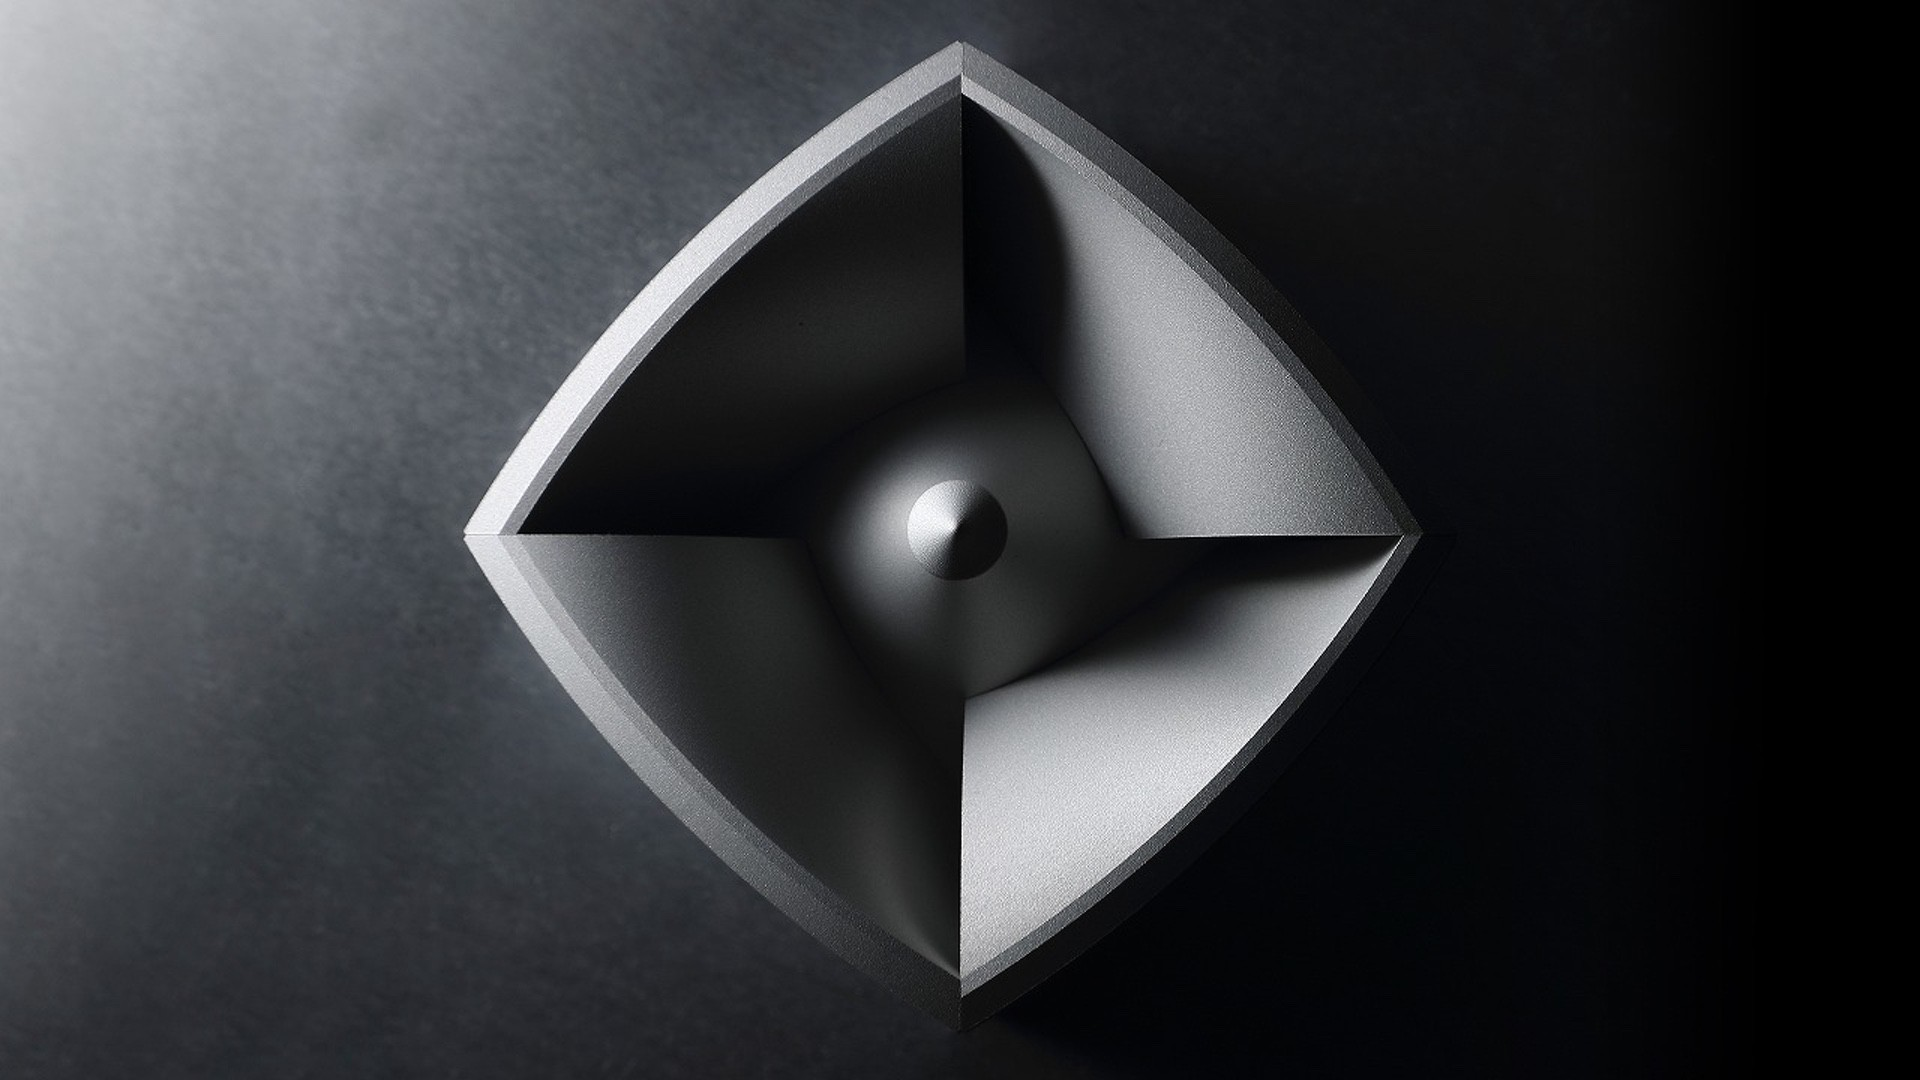 4Design_BBS_F1_chocolate_wheels-0002